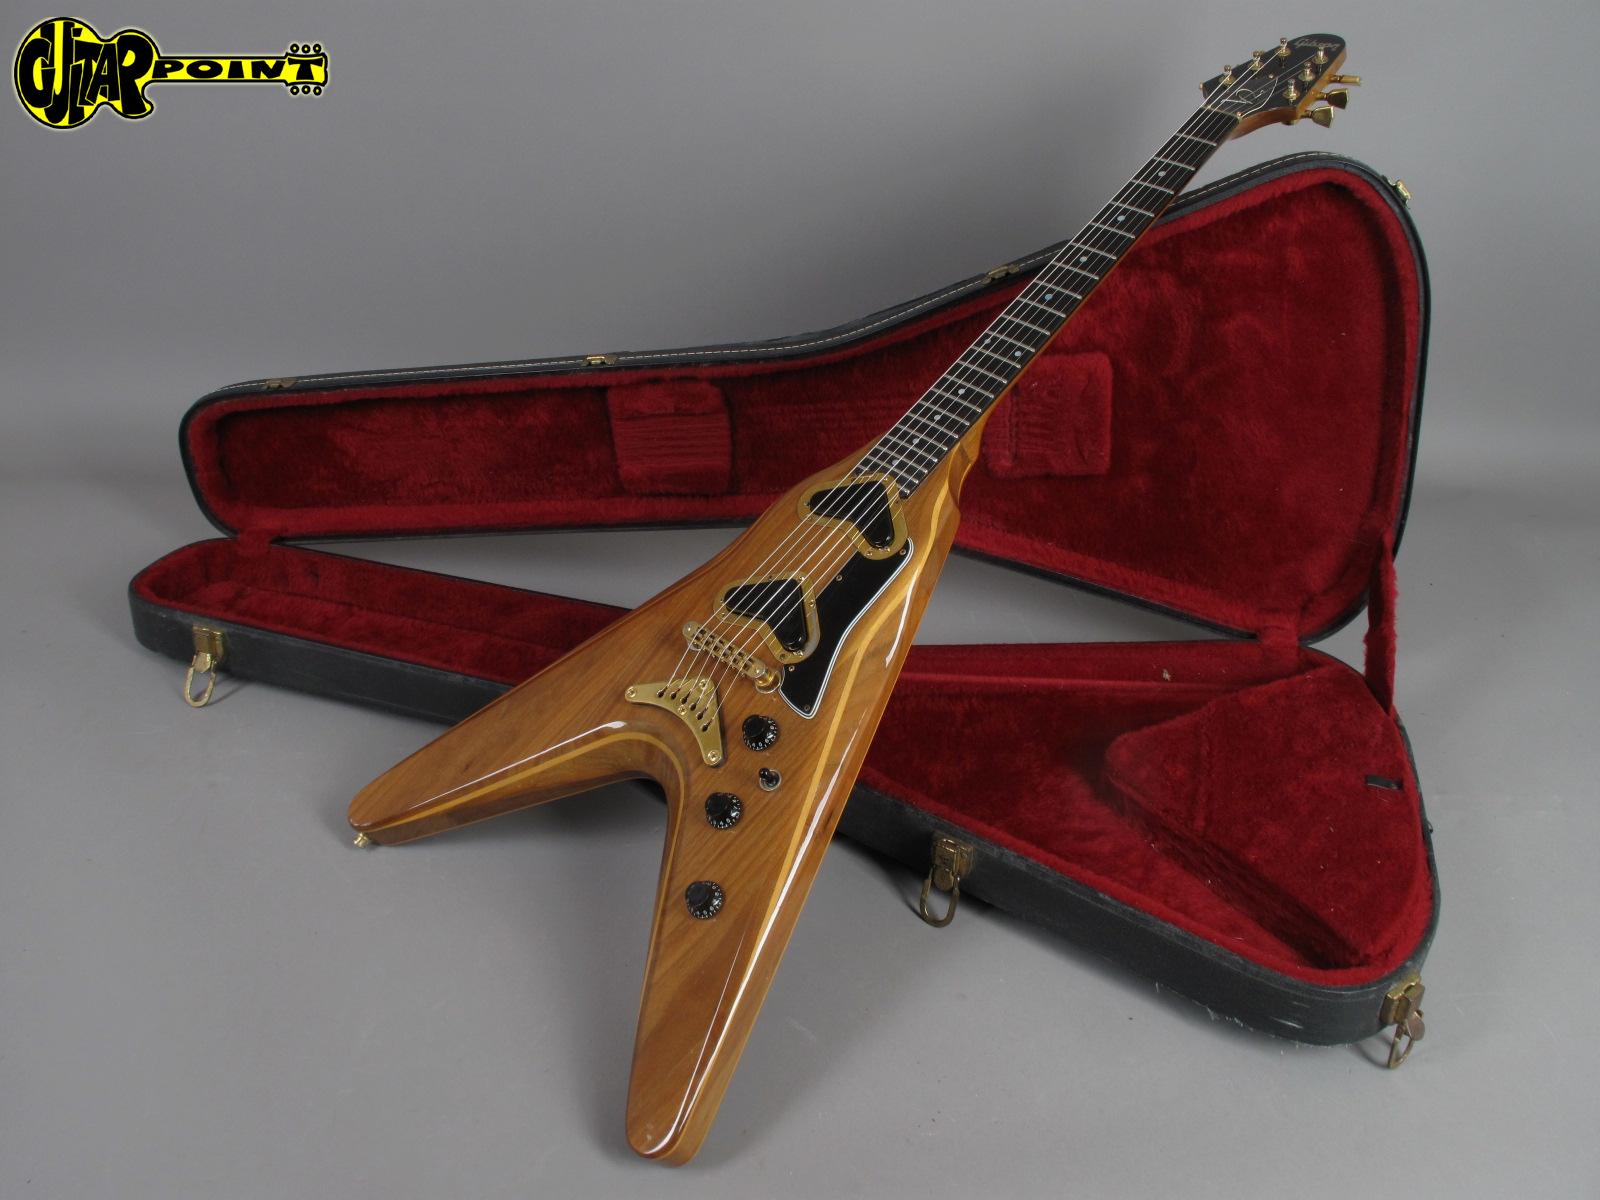 https://guitarpoint.de/app/uploads/products/1980-gibson-flying-v2-natural/Vi80GiFlVV280090118_18.jpg